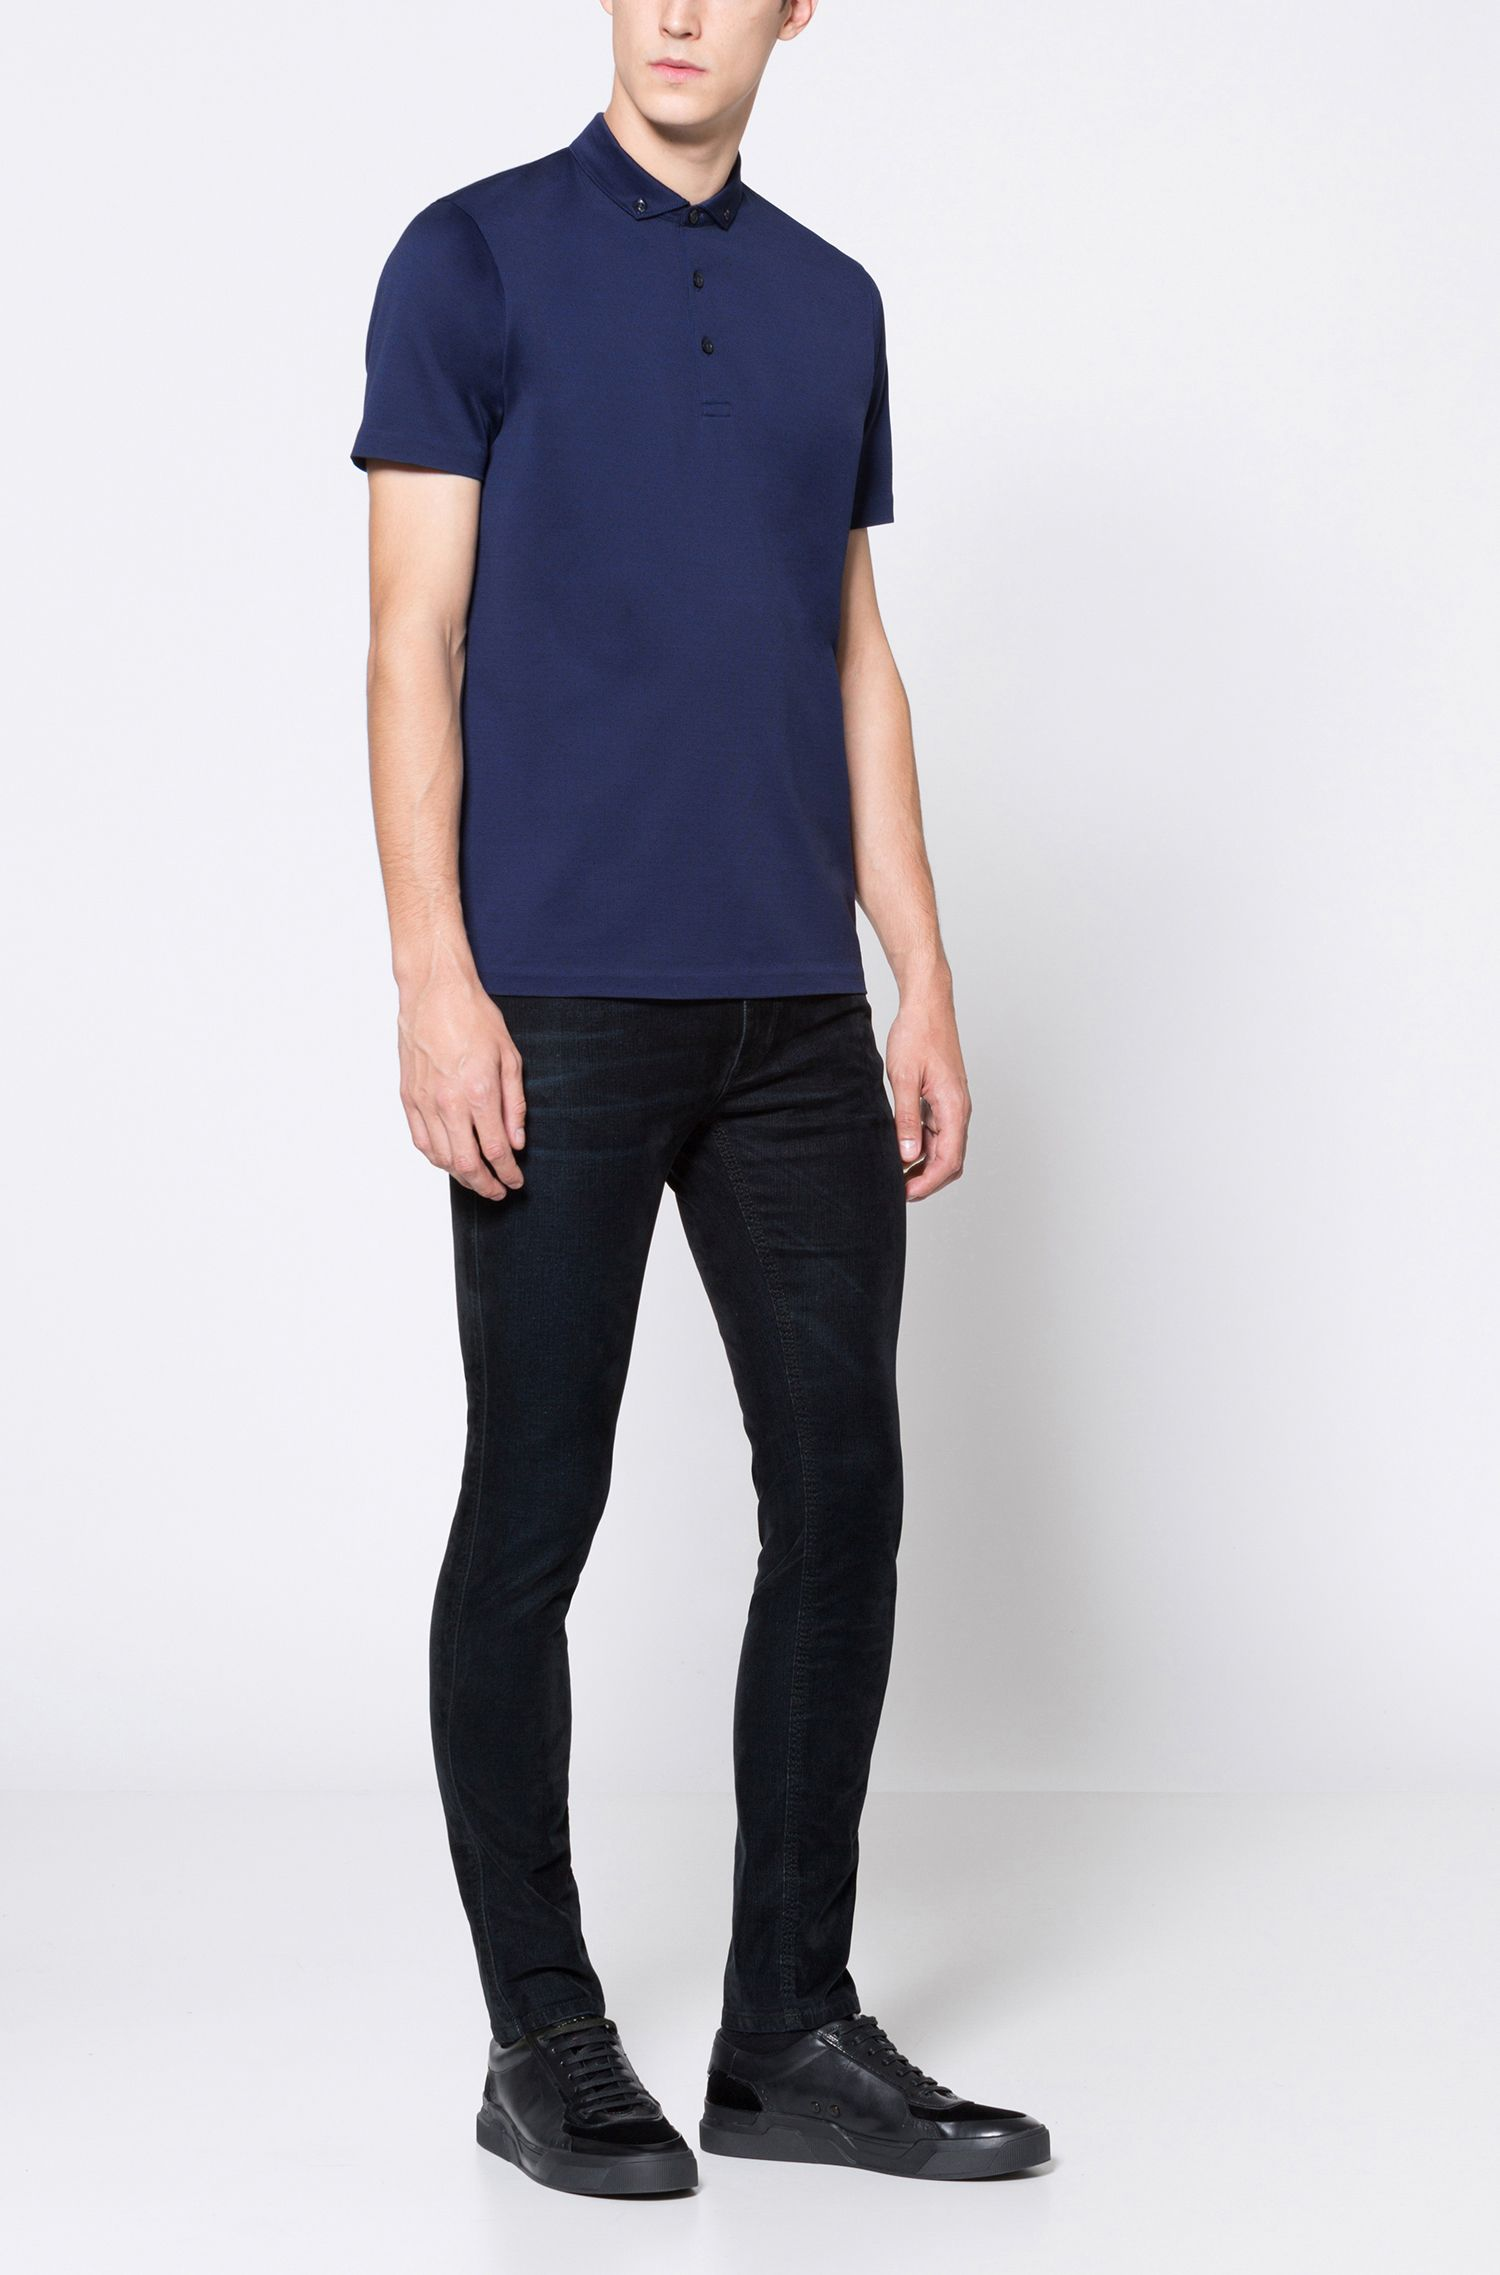 Jacquard Mercerized Cotton Polo Shirt, Regular Fit   Dogart, Dark Blue